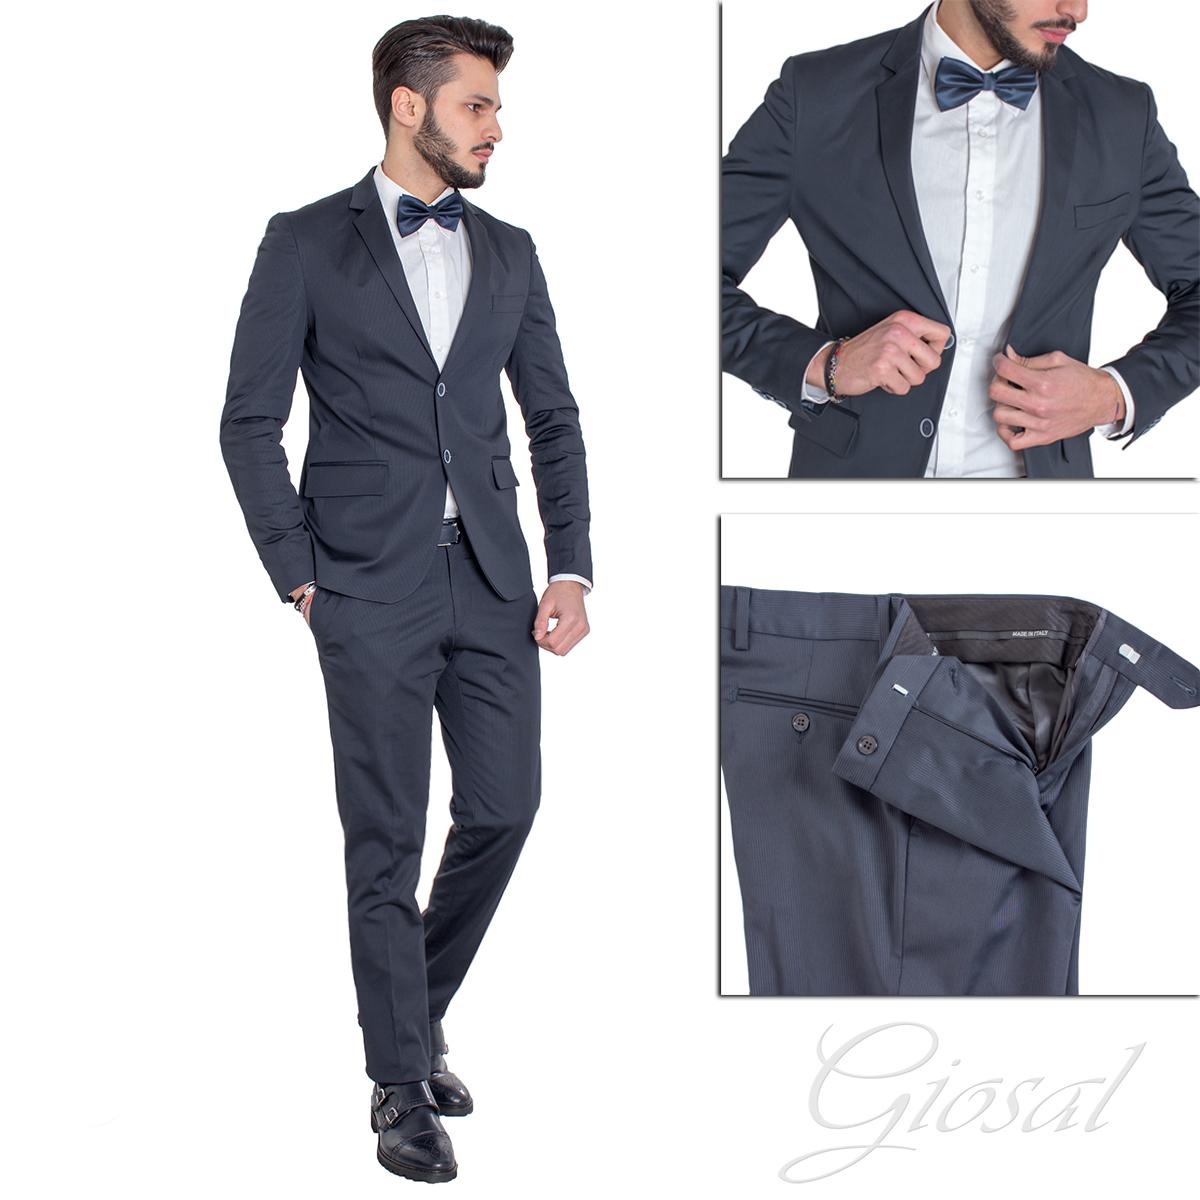 2a85696022aa Abito Elegante Uomo Vestito Giacca Pantalone Blu Tinta Unita GIOSAL -  AE1010A